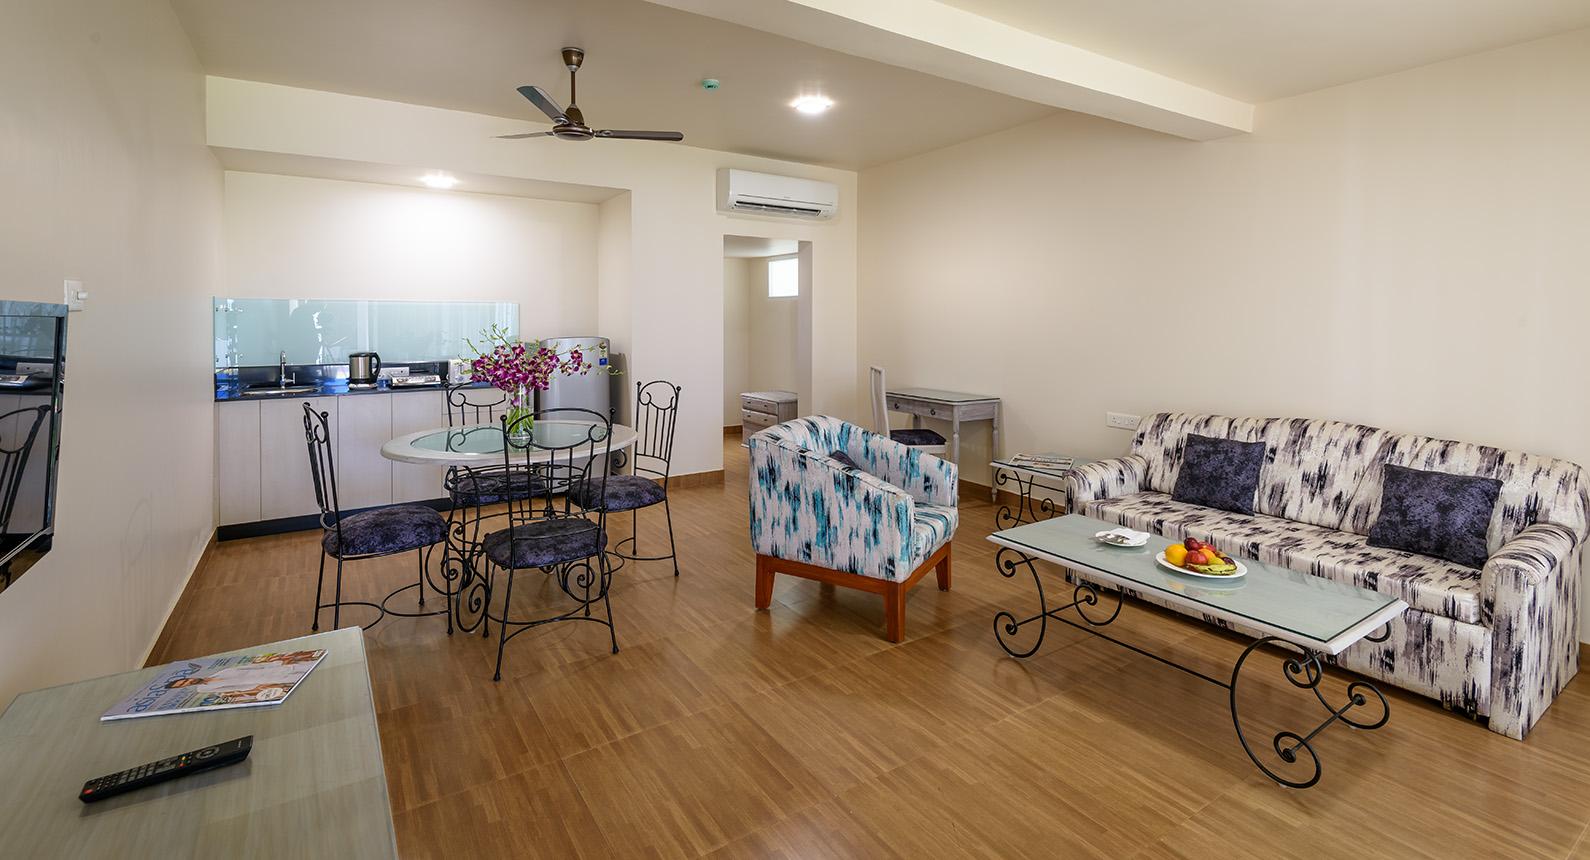 Karma Royal Benaulim Rooms and Accommodation